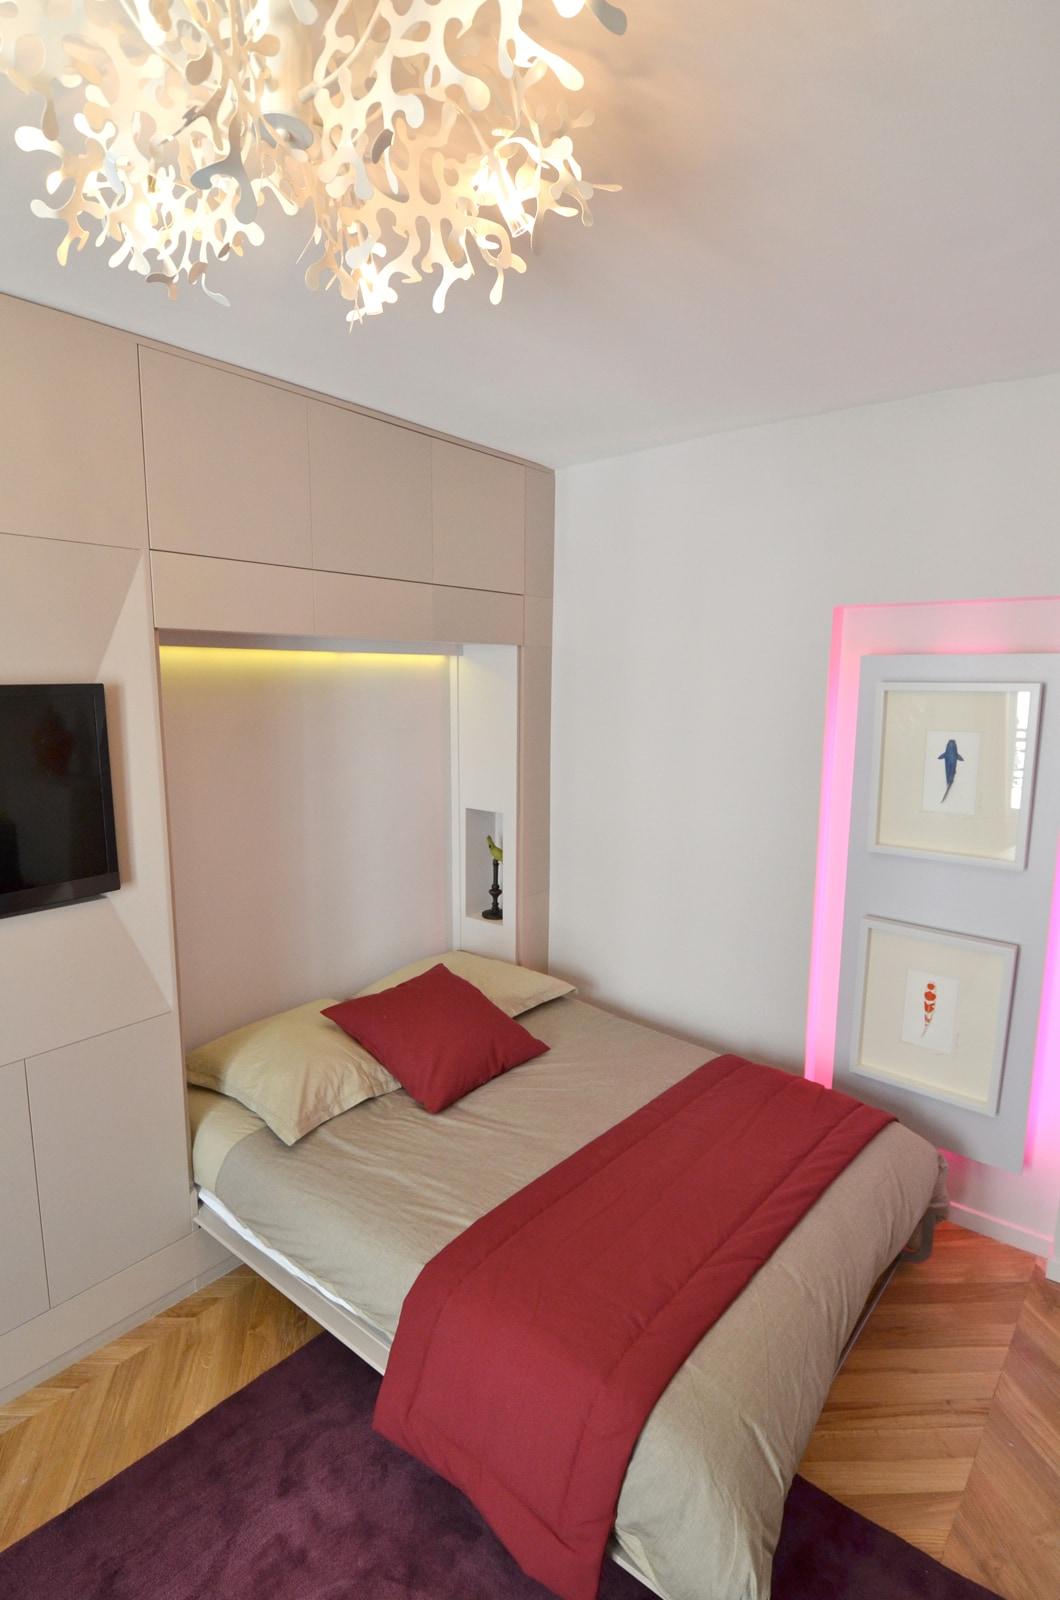 Bed hid in the wall in the livingroom Lit caché dans le mur dans le salon